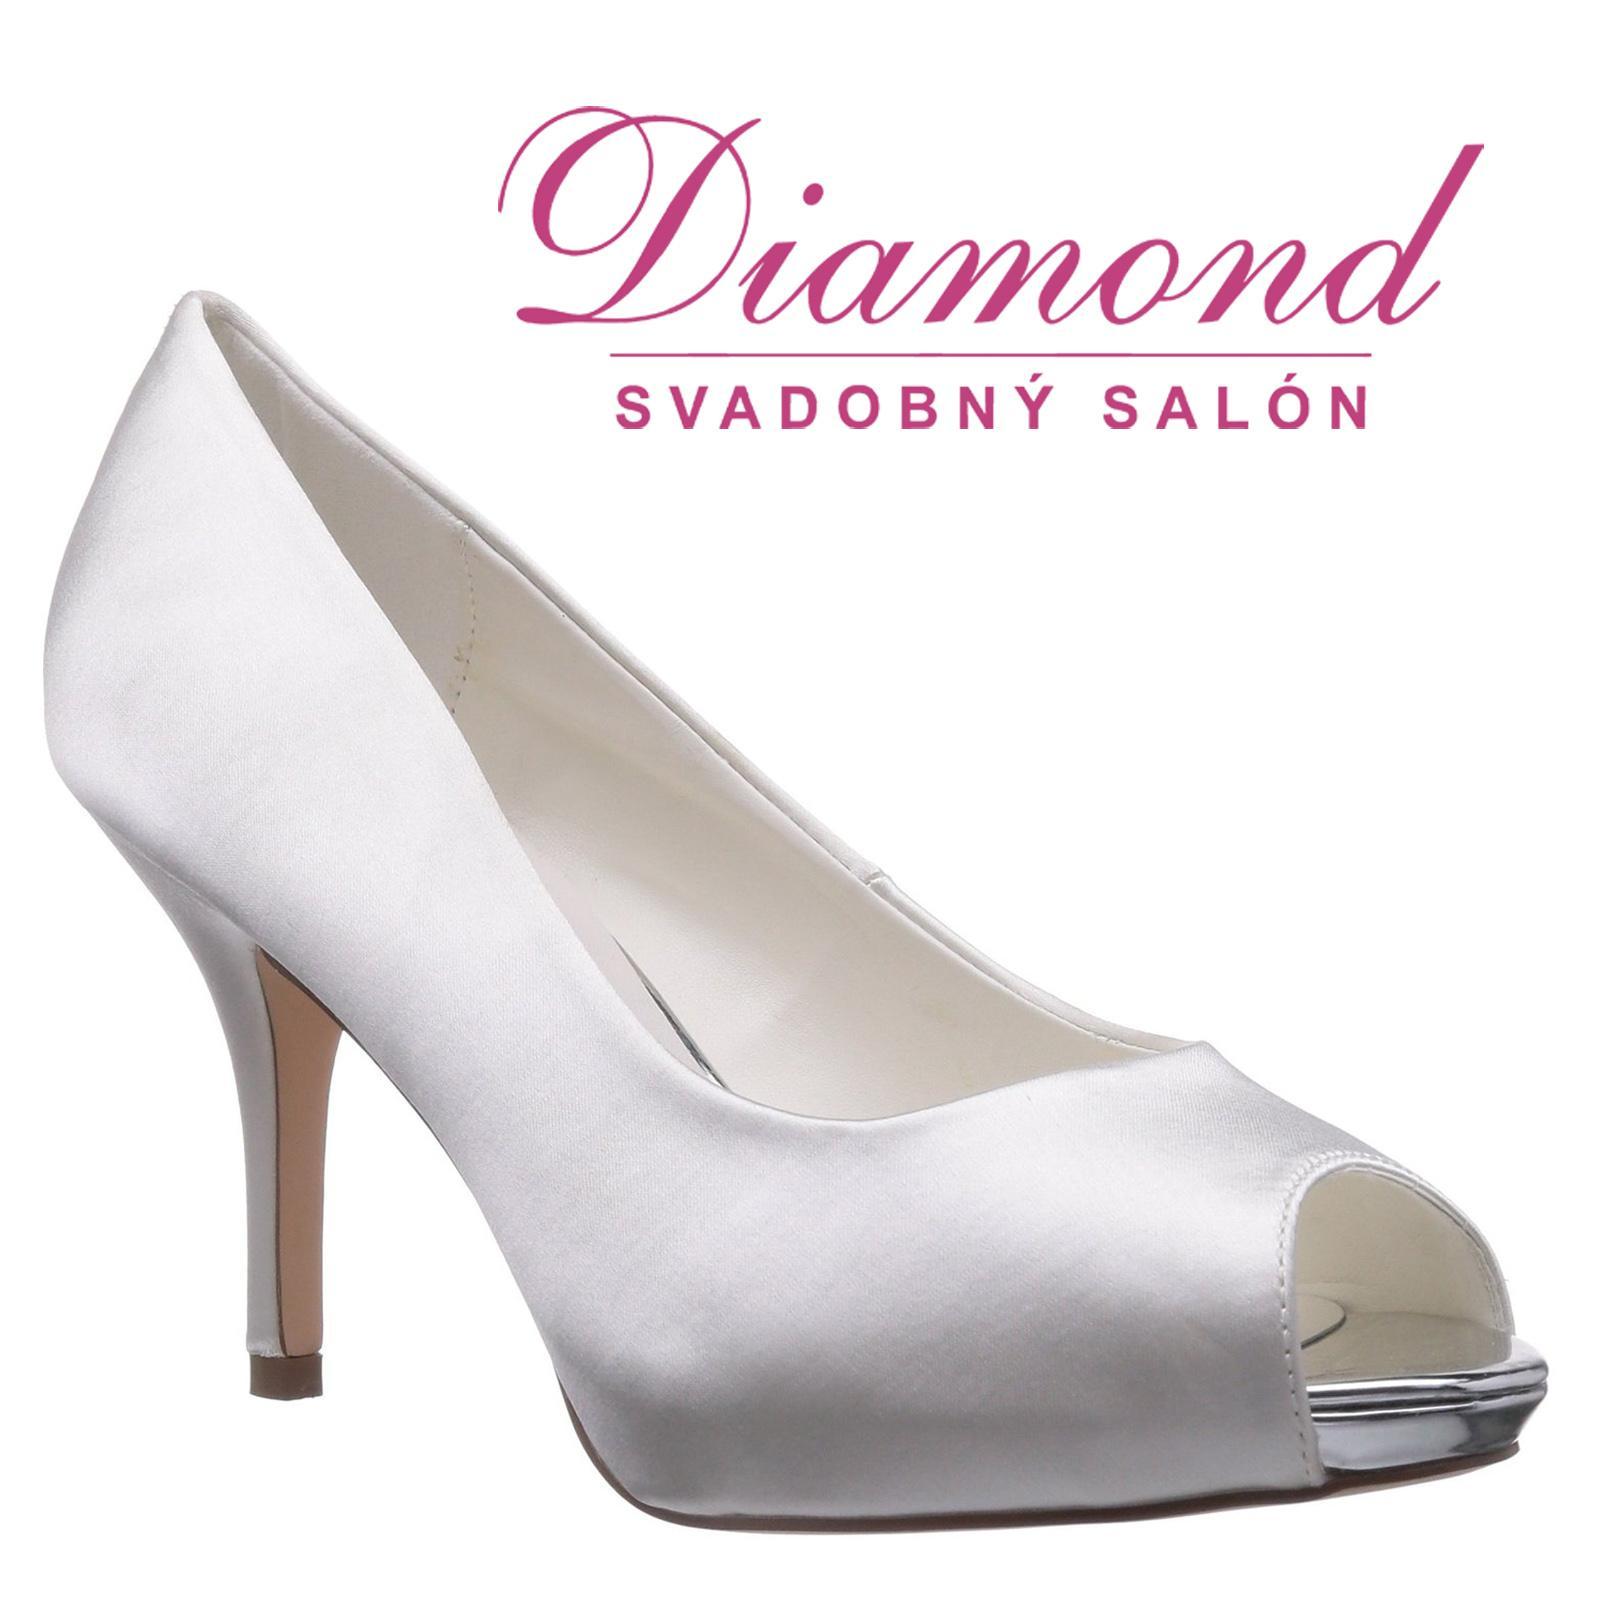 Svadobné topánky Amália (6264) - Obrázok č. 1